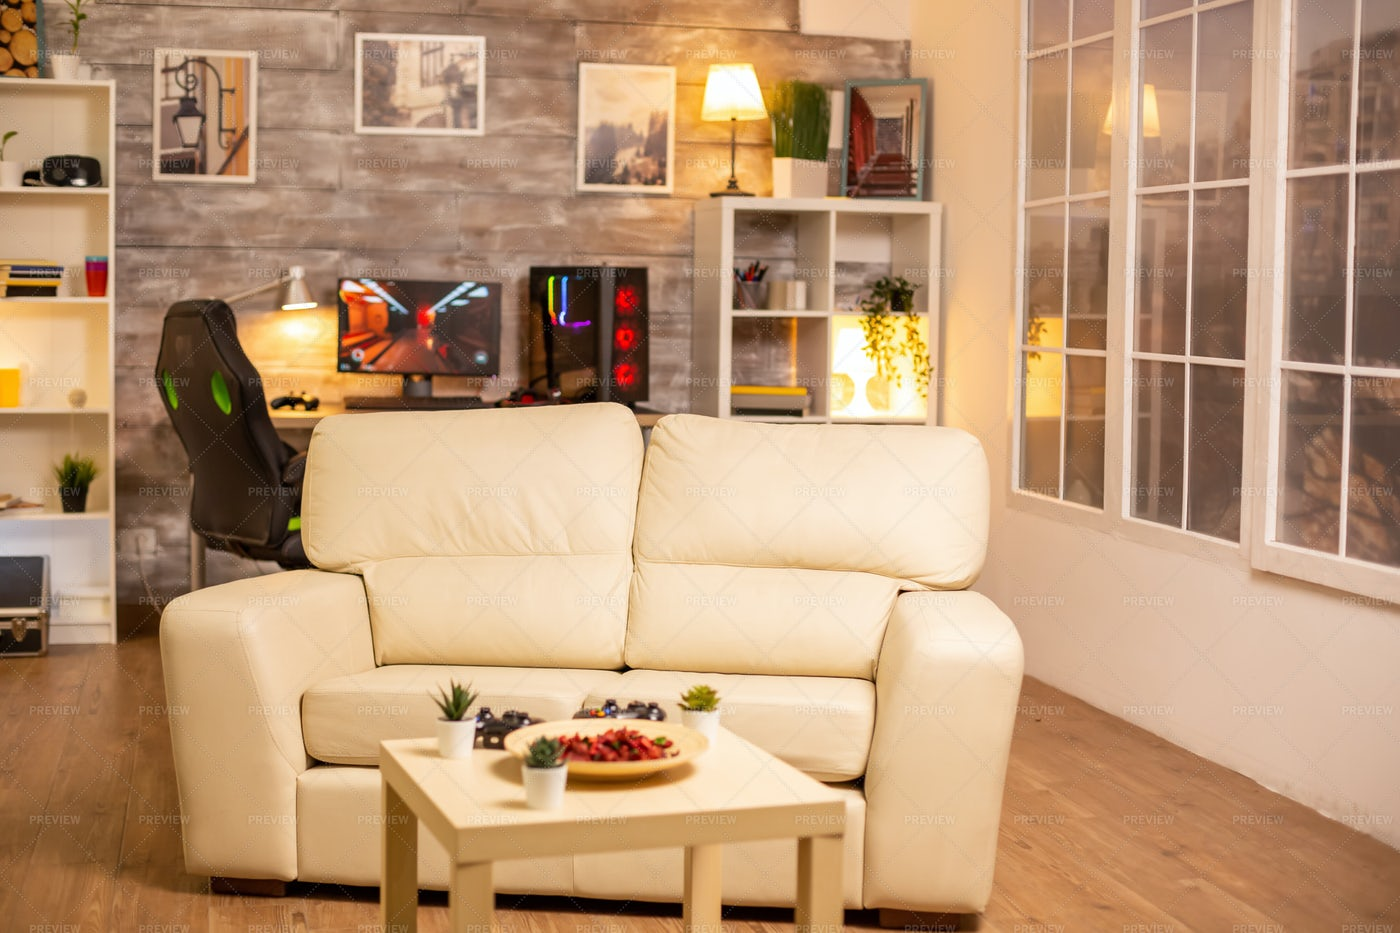 Empty Living Room Interior: Stock Photos